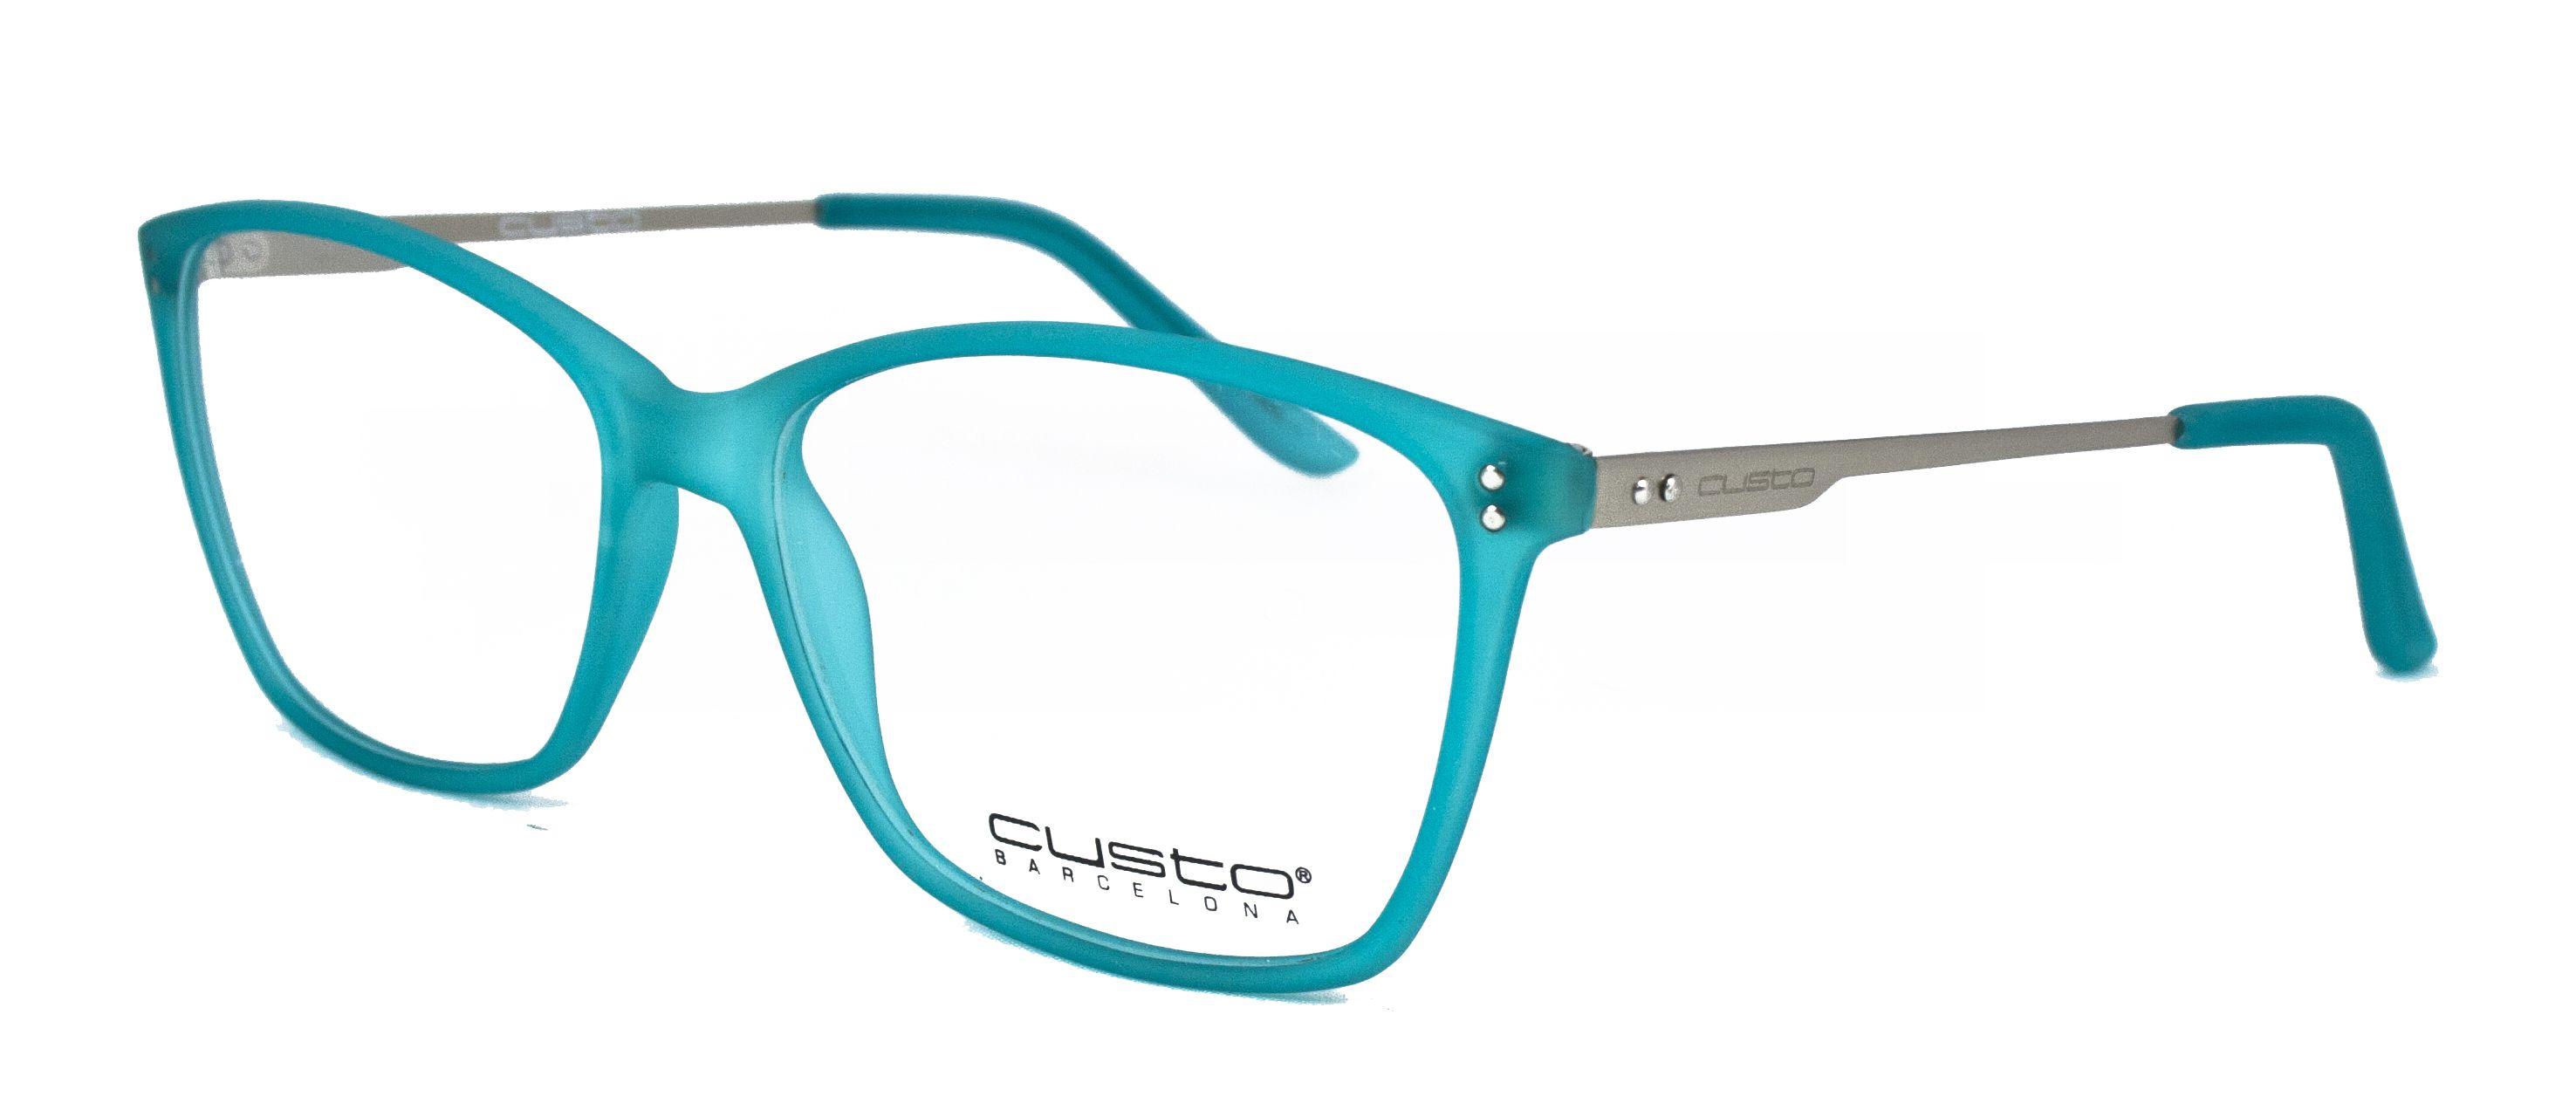 Por Barcelona Custo Gafas OpticaliaMontura Turquesa Diseñadas Para OZTikXuP